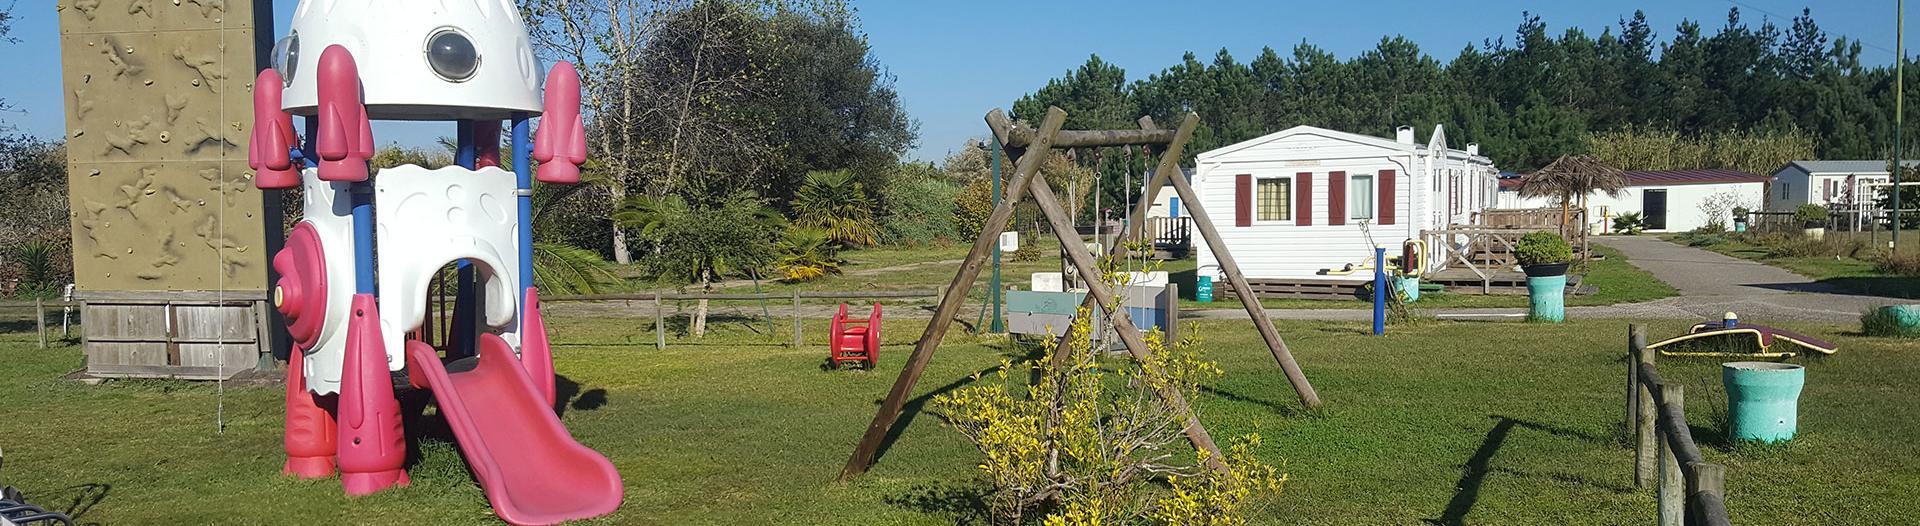 slider-camping-land-hause-mobil-homes